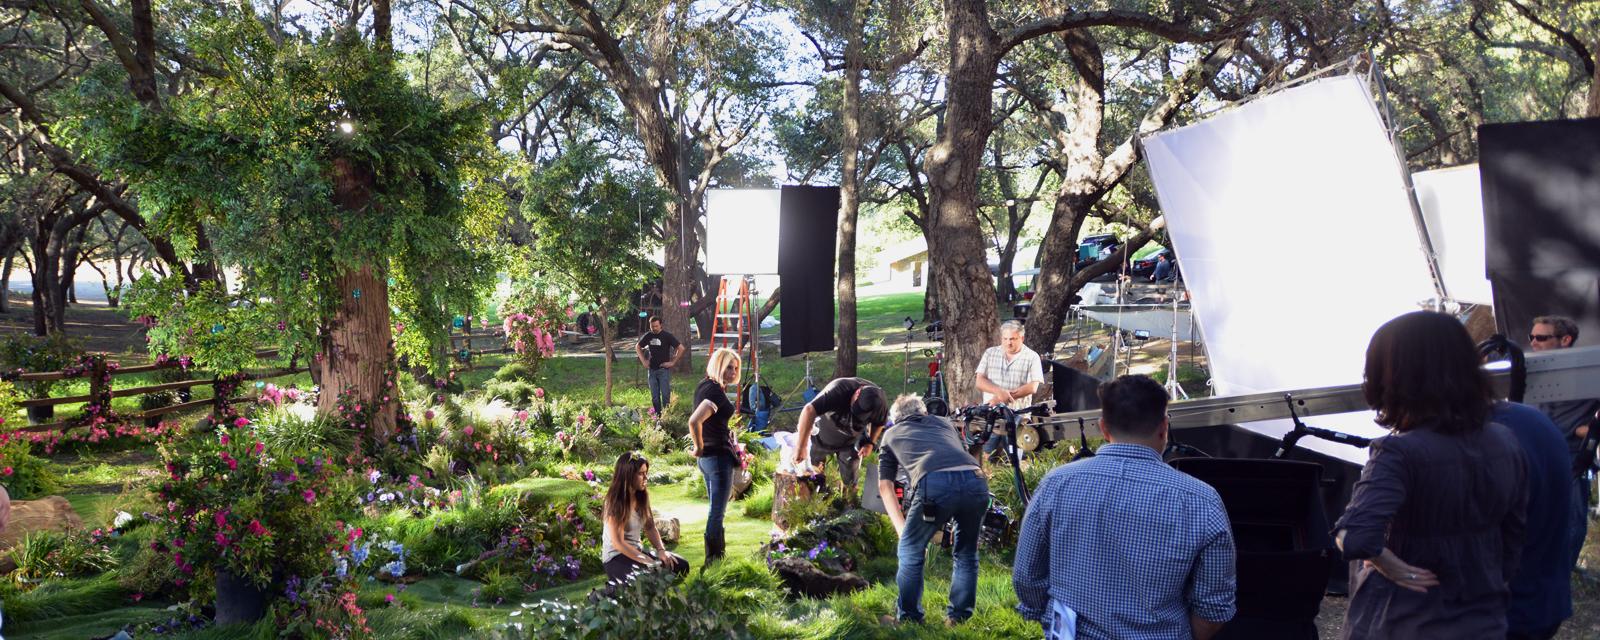 Toy Commercial, location shoot, calabasas, set lighting, geronimo creek, gaffer